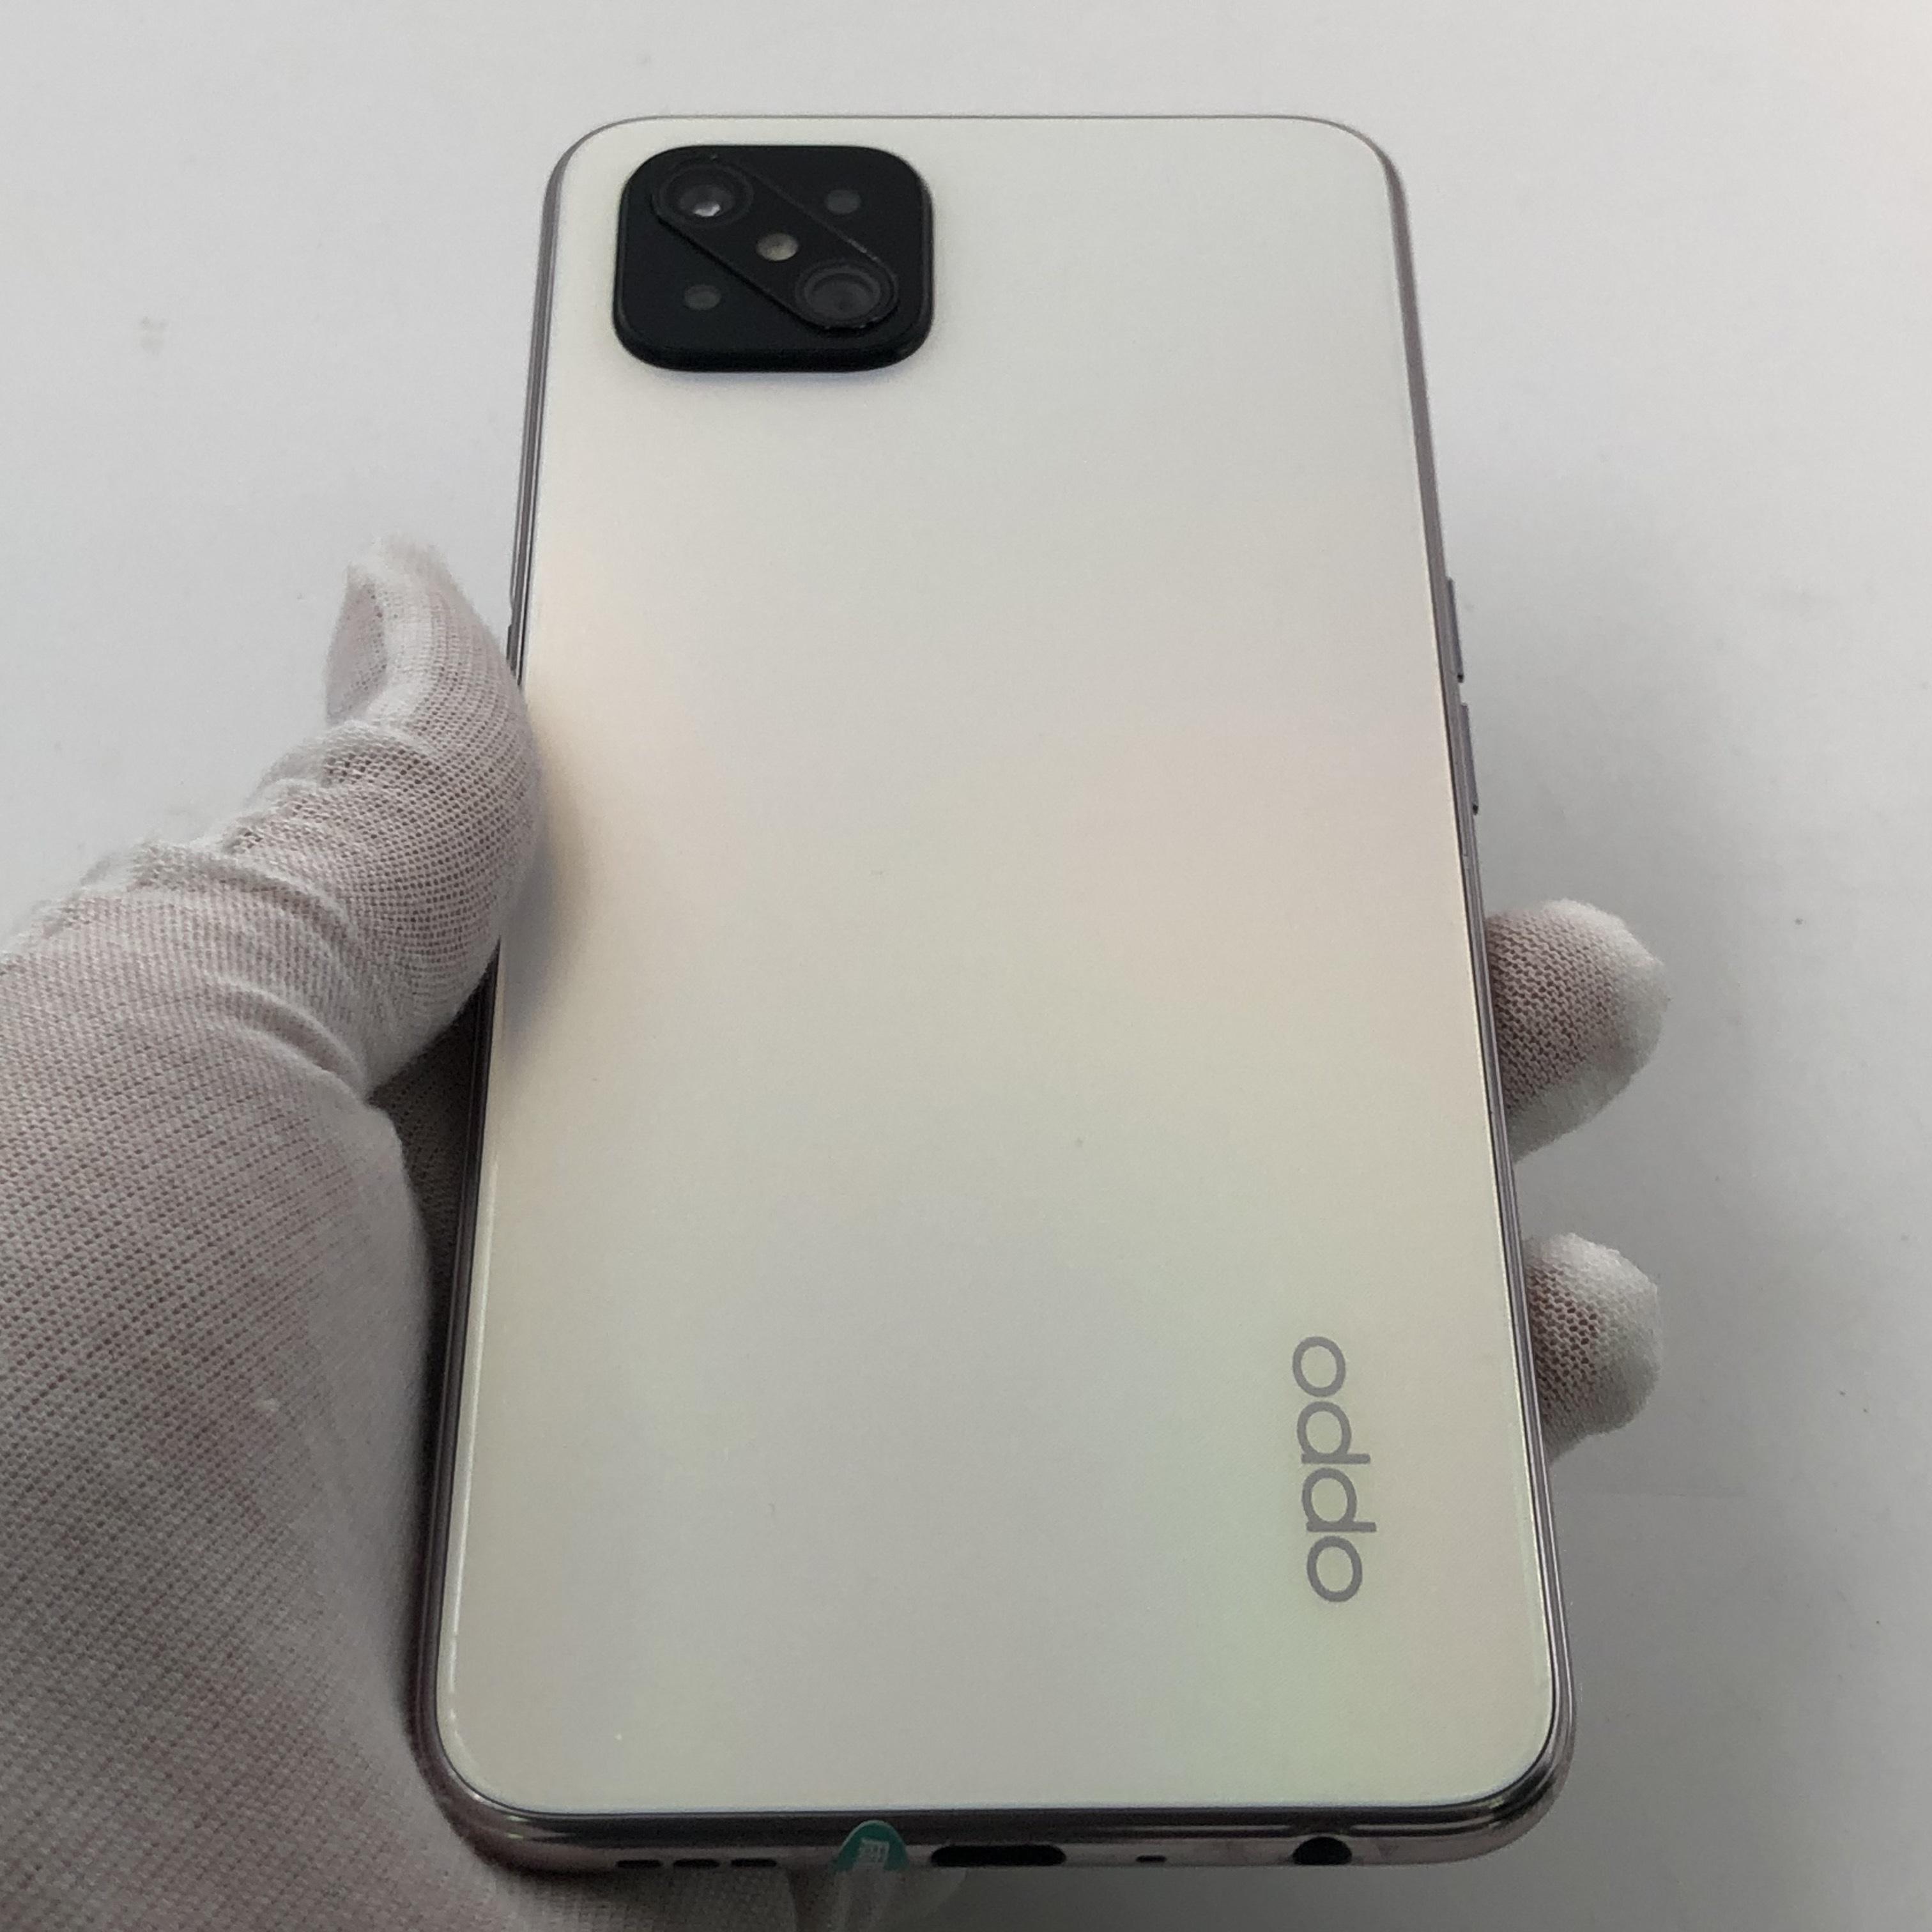 oppo【A92s(5G)】5G全网通 私语白 8G/128G 国行 8成新